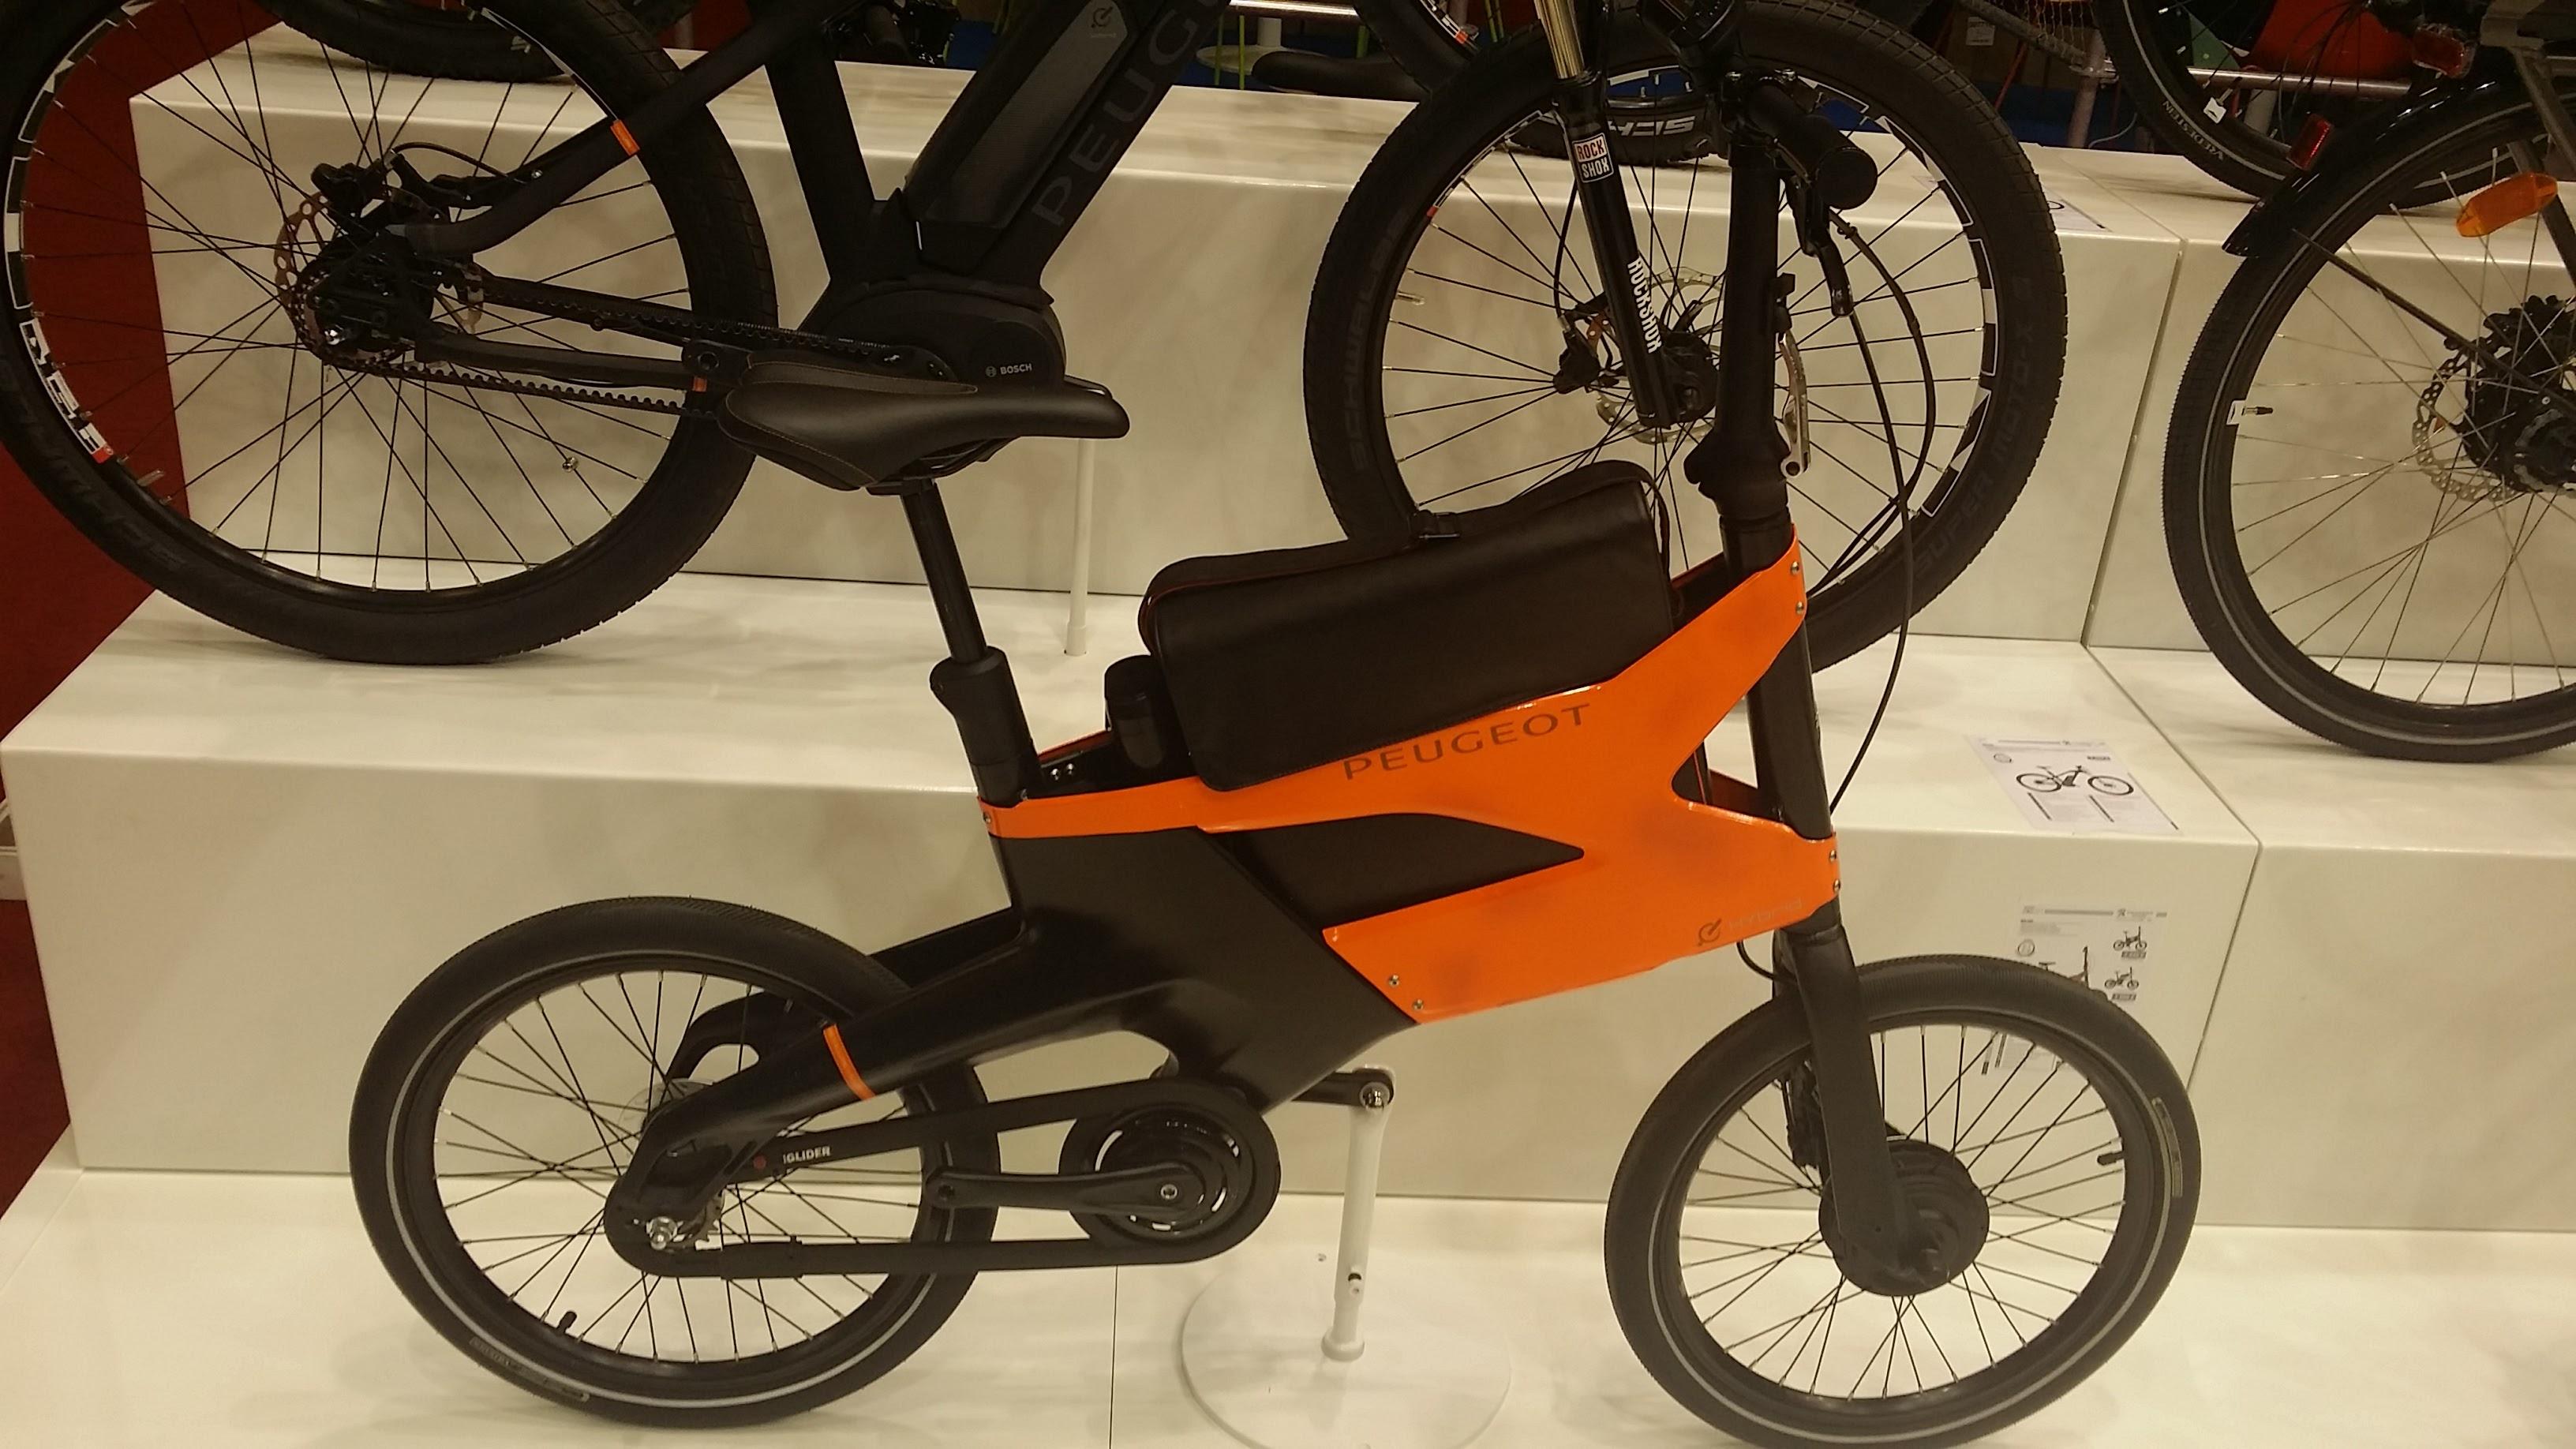 le v lo urbain hybrid bike ae21 de chez peugeot. Black Bedroom Furniture Sets. Home Design Ideas